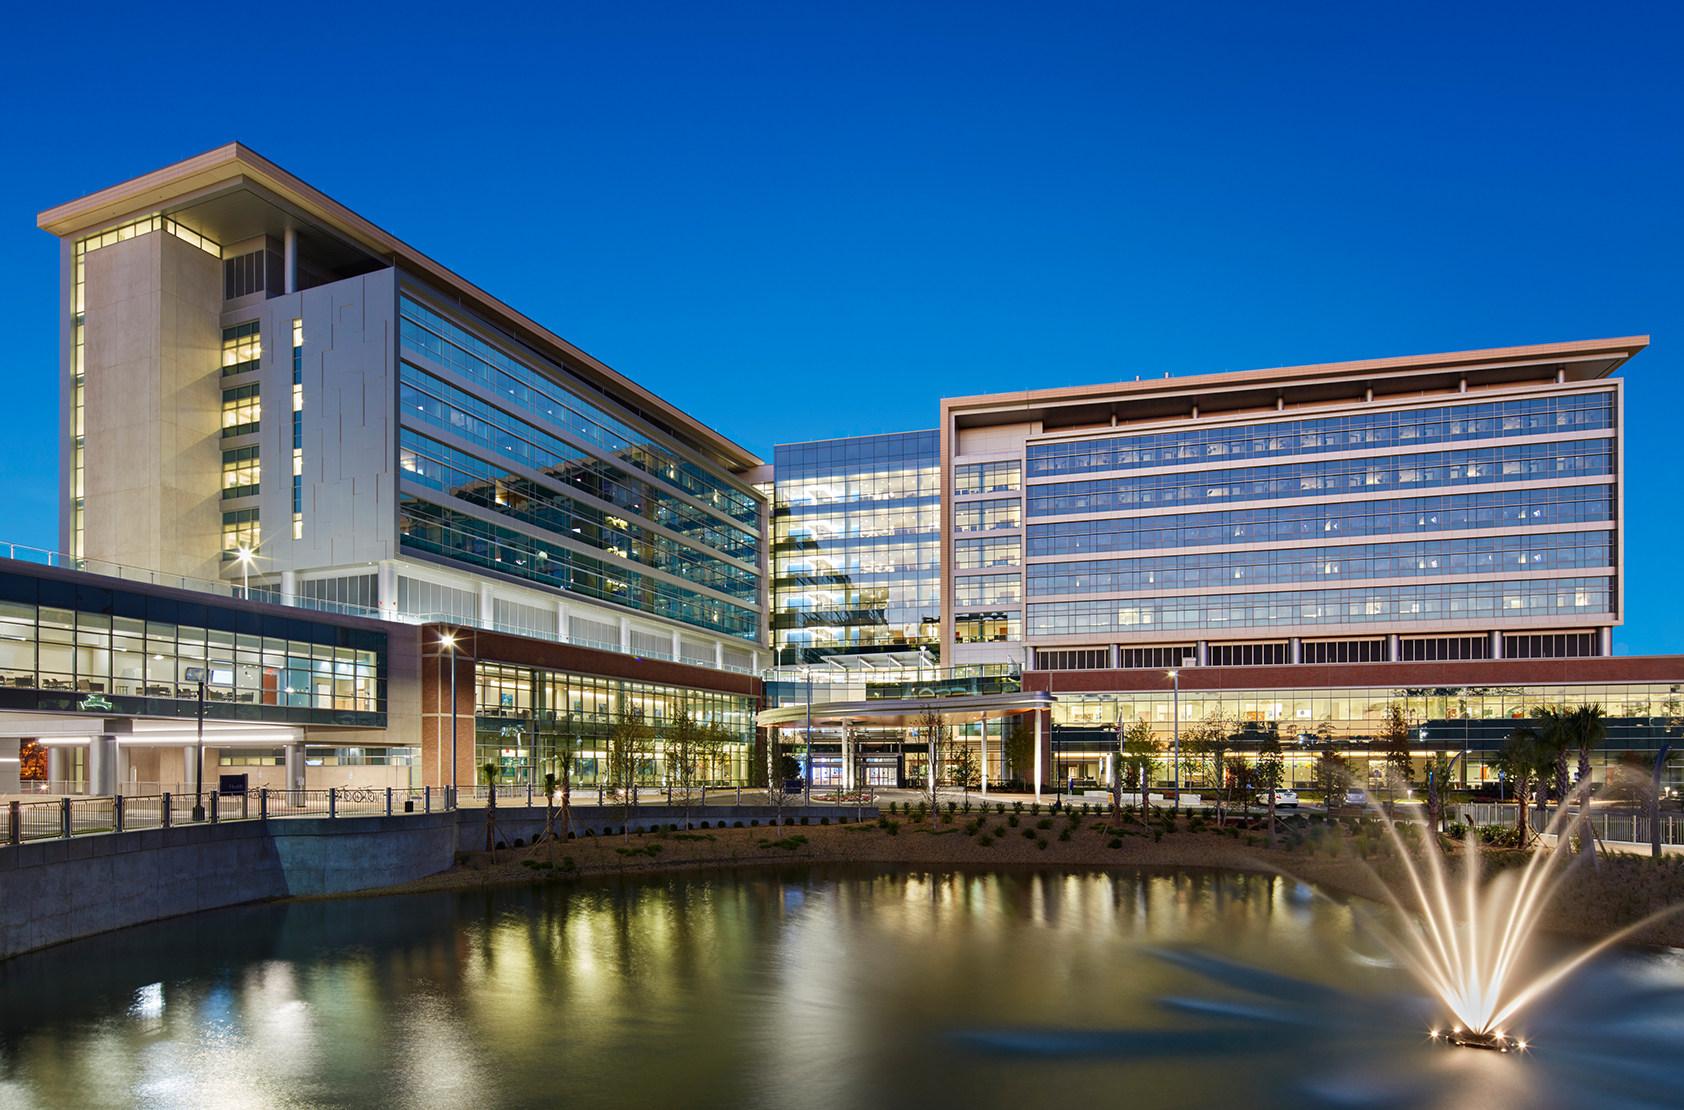 UF Health - Heart & Vascular Hospital and UF Health Neuromedicine Hospital